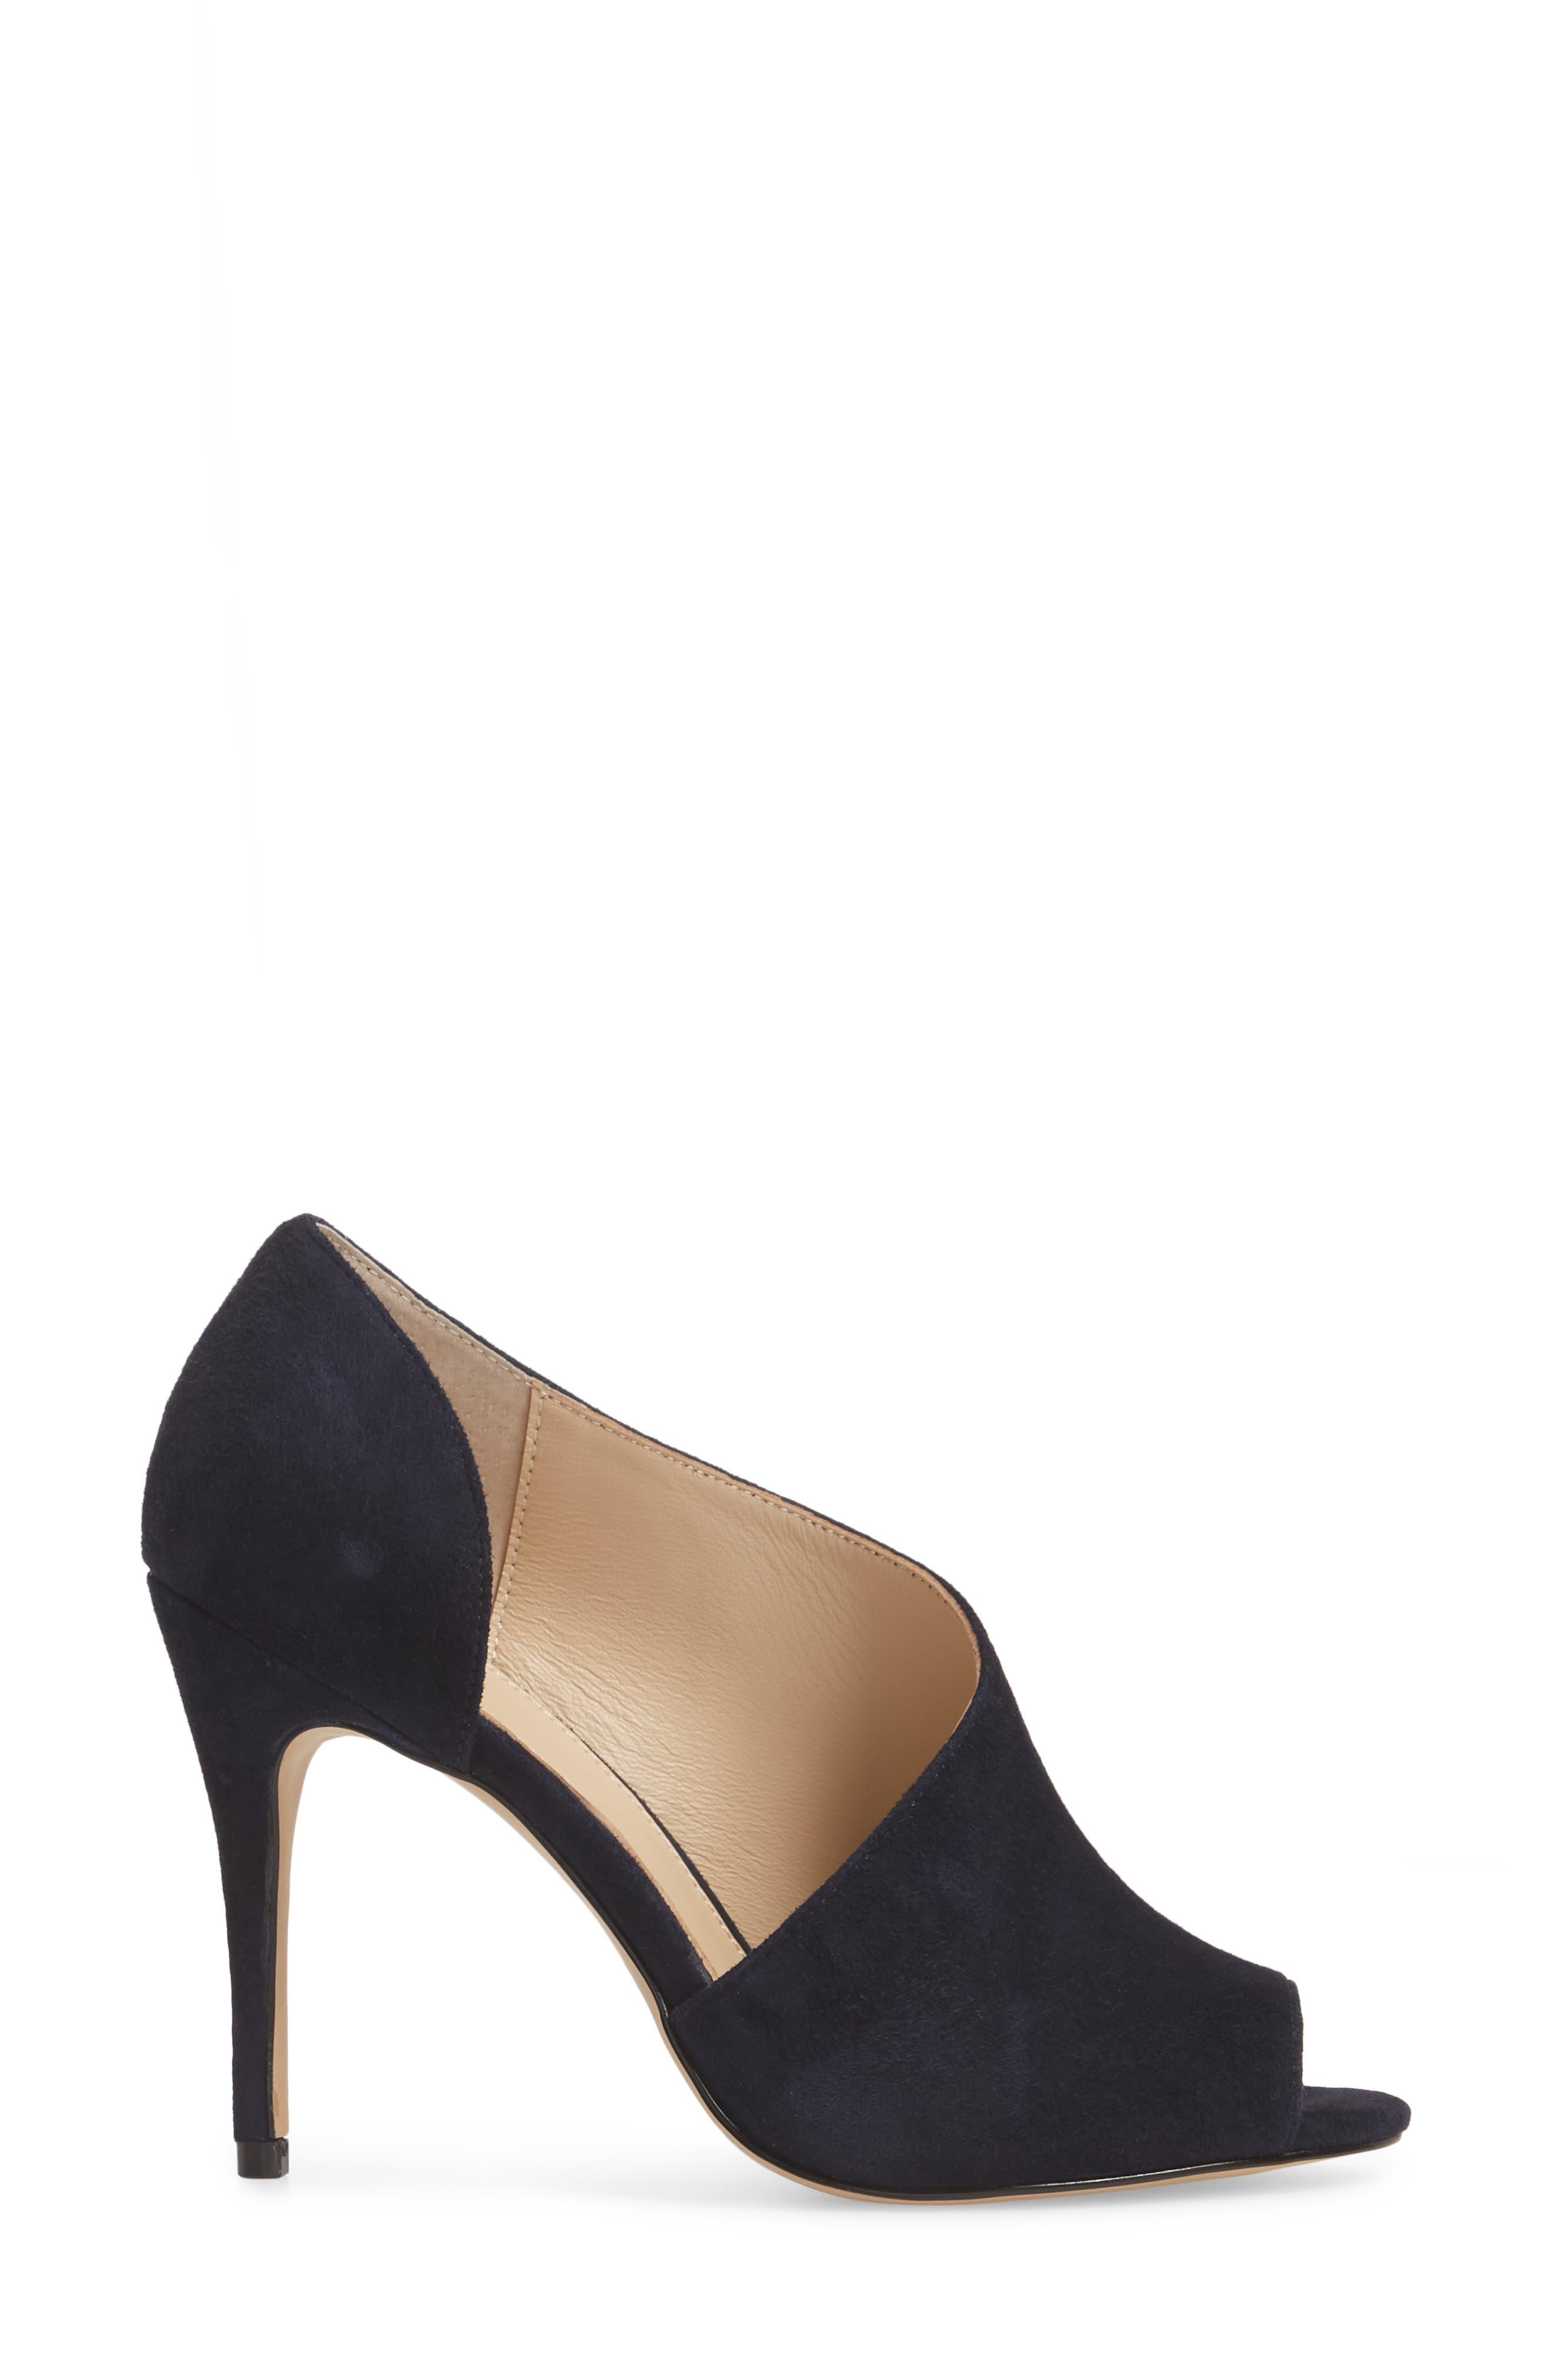 Adelia Asymmetrical Sandal,                             Alternate thumbnail 3, color,                             Navy Suede